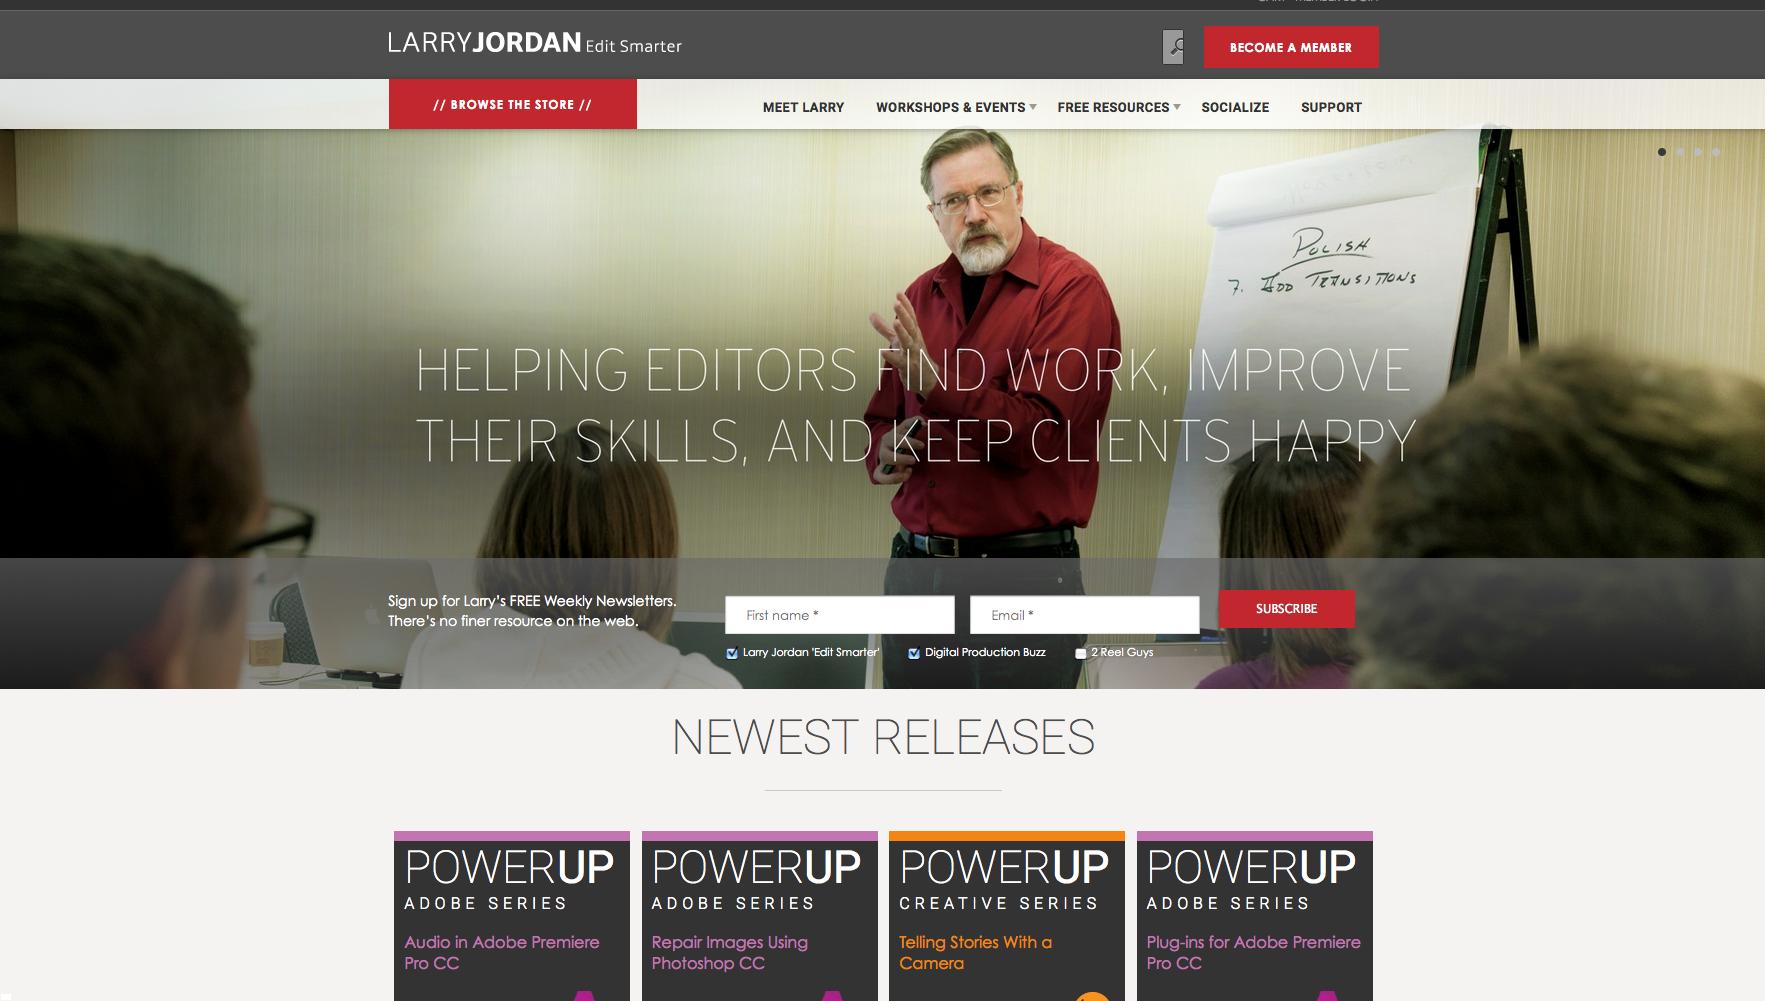 LarryJordan.com